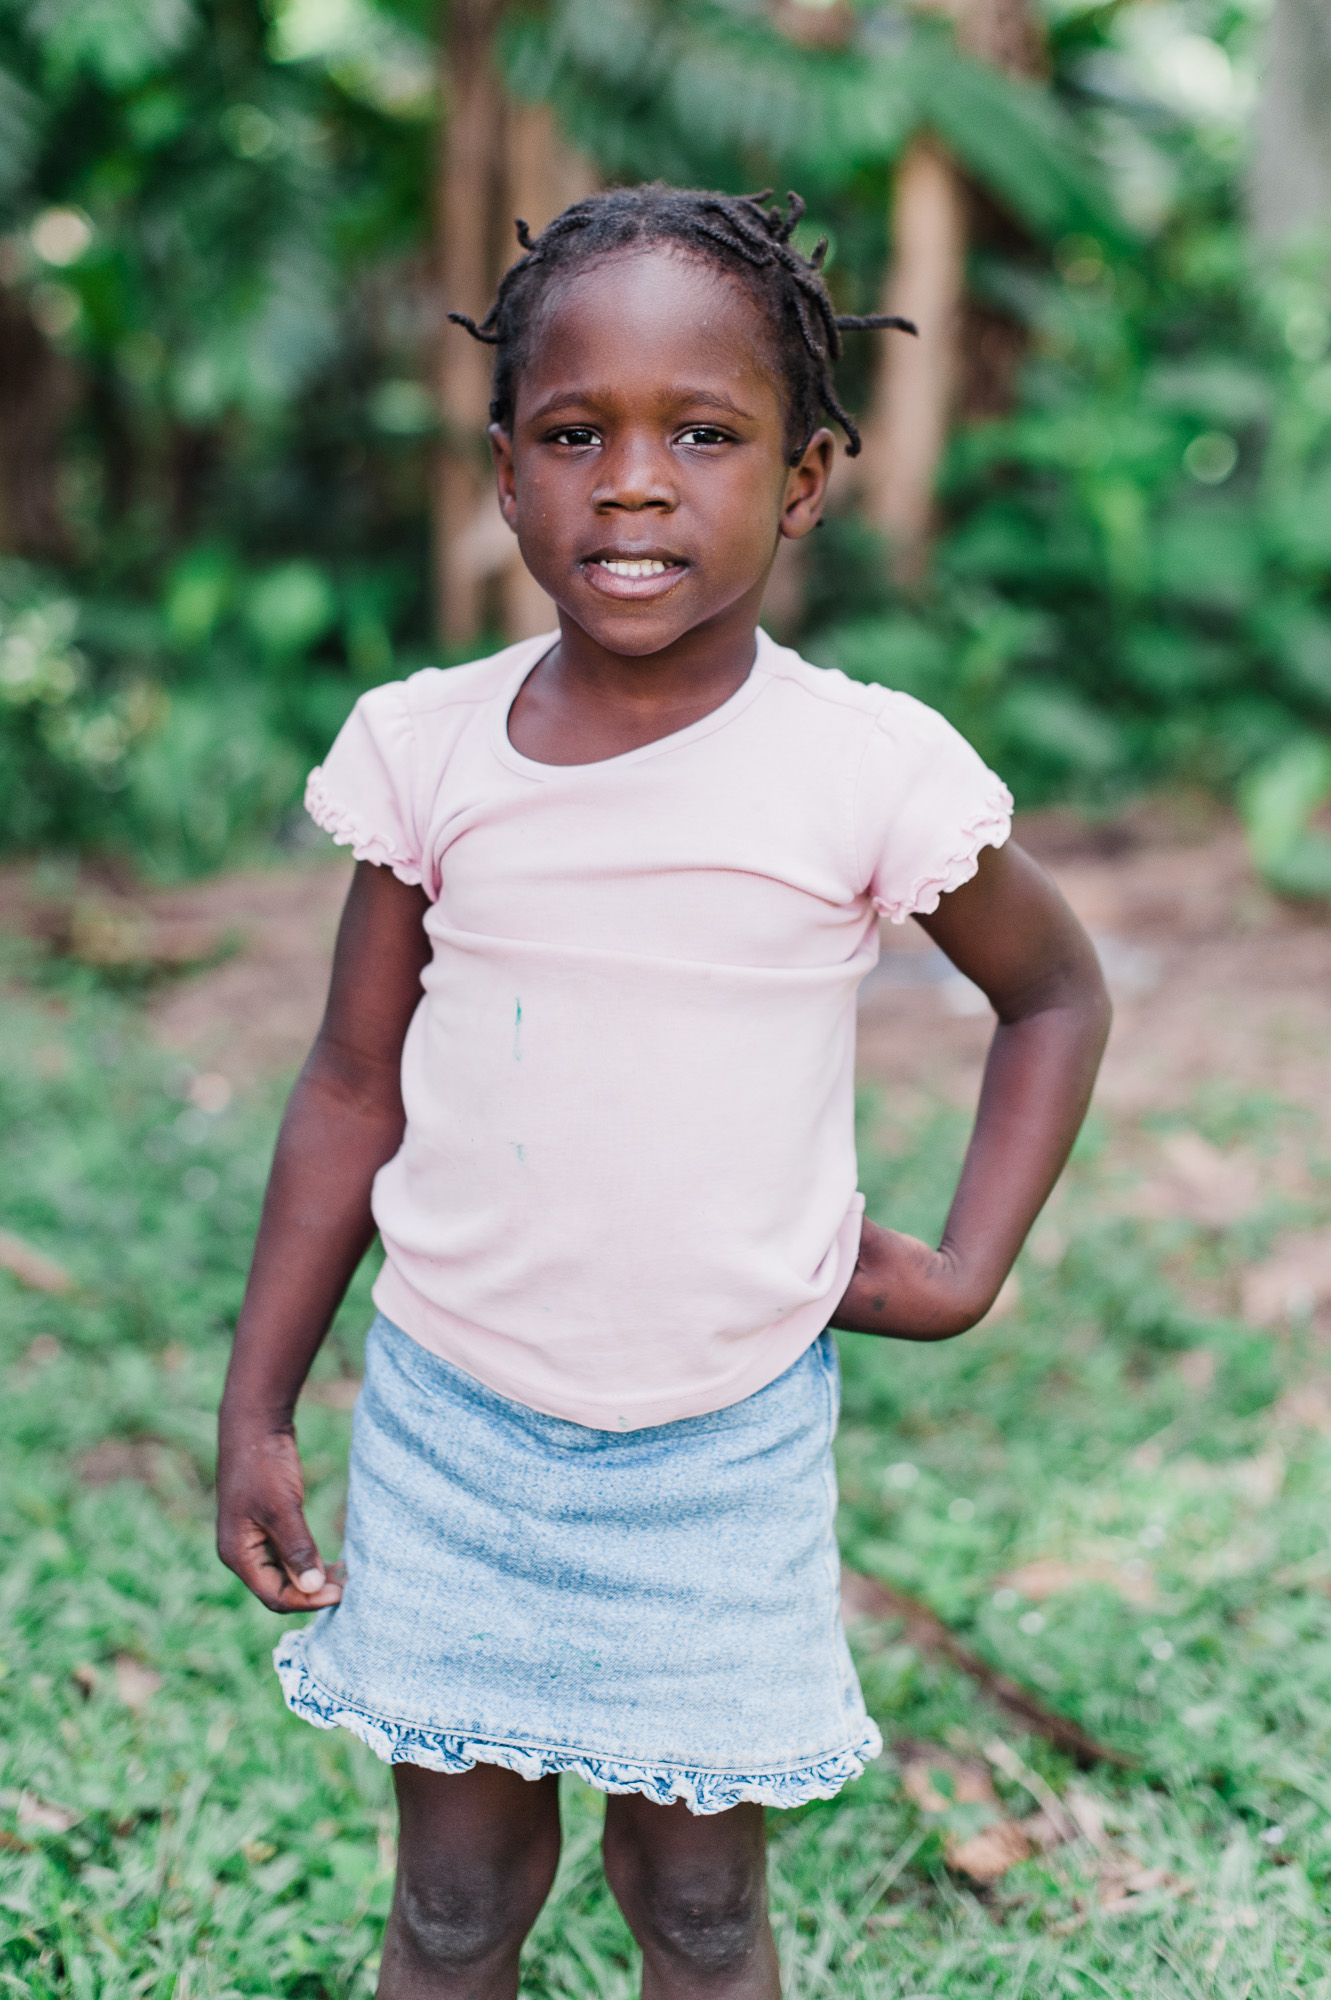 Shayna, age 4